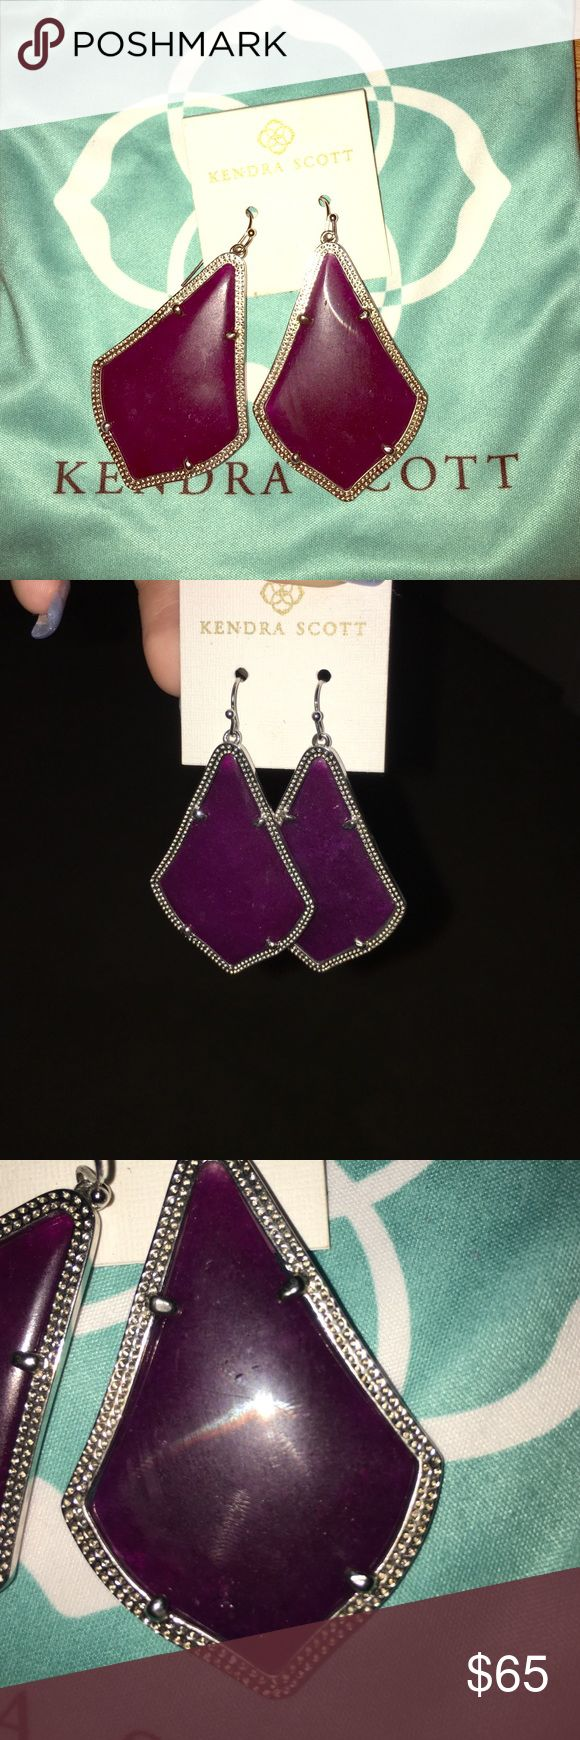 Kendra Scott Alex Rose Purple Quart Earrings They are purple alex rose earrings with sliver lining, custom made at the color bar in the Kendra Scott store, good condition Kendra Scott Jewelry Earrings